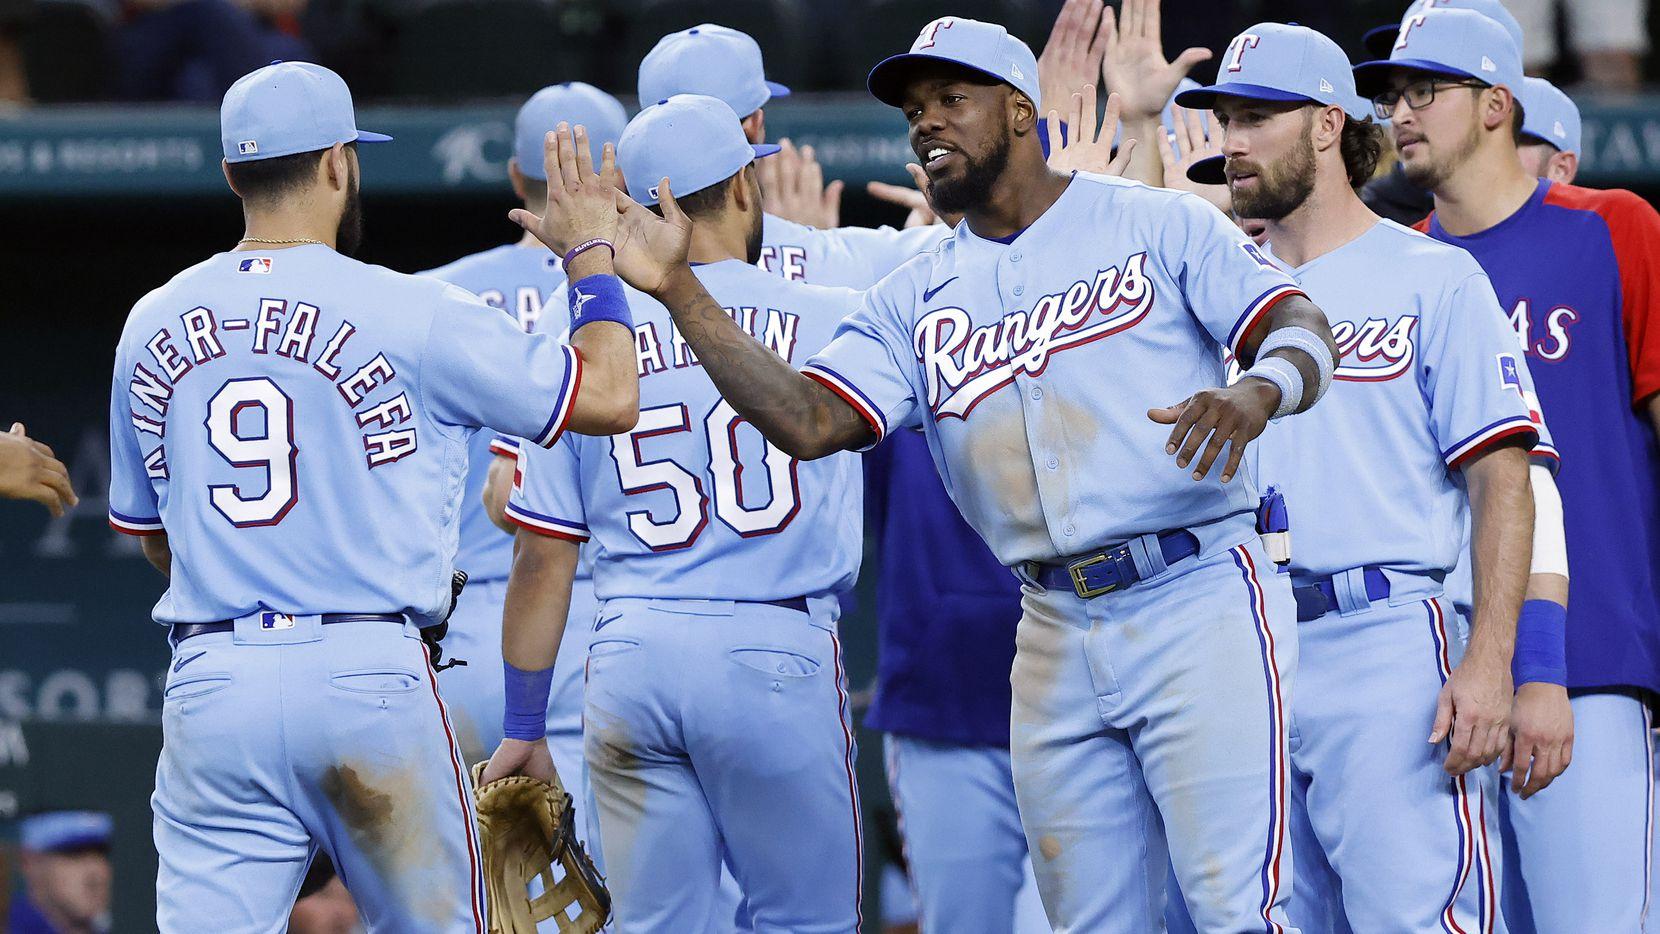 Texas Rangers right fielder Adolis Garcia (right) congratulates third baseman Isiah Kiner-Falefa (9) after their 4-1 win against the Kansas City Royals at Globe Life Field in Arlington, Texas, Friday, June 27, 2021.